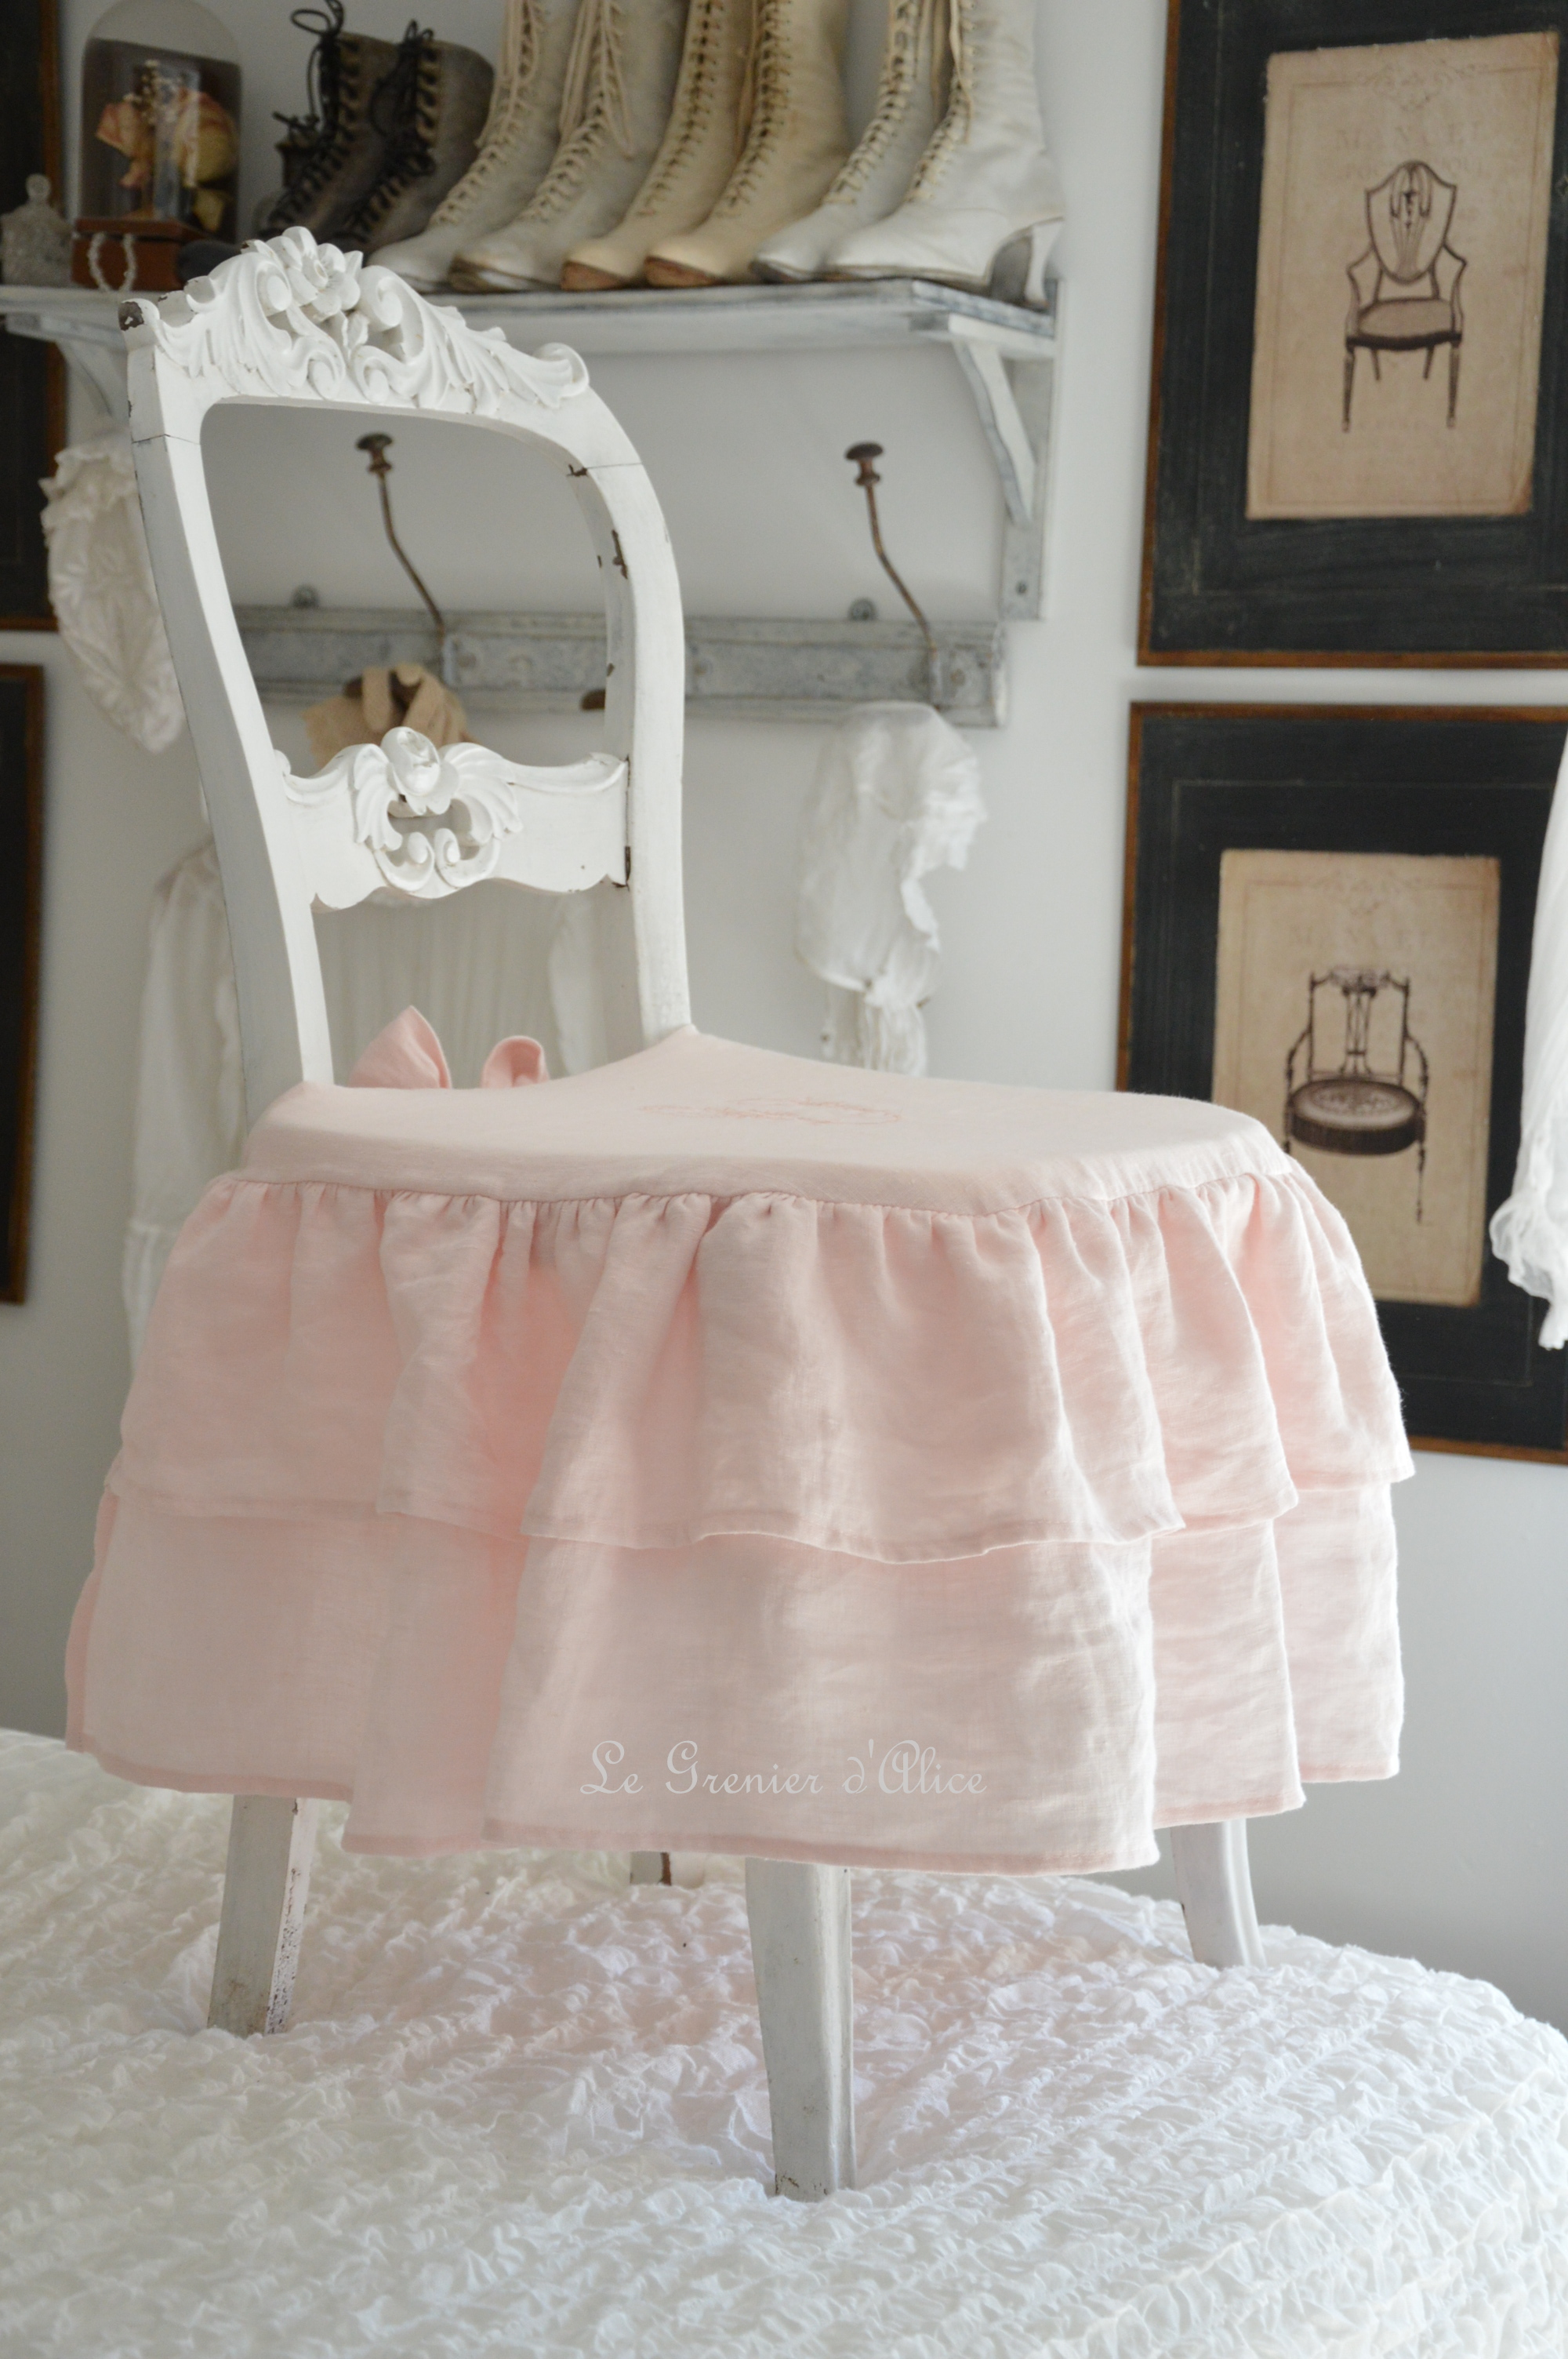 Galette De Chaise Shabby Chic Romantique Charme Housse Lin Stone Washed Lav Froiss Rose Poudr Clair Bonbon Broderie Machine 1